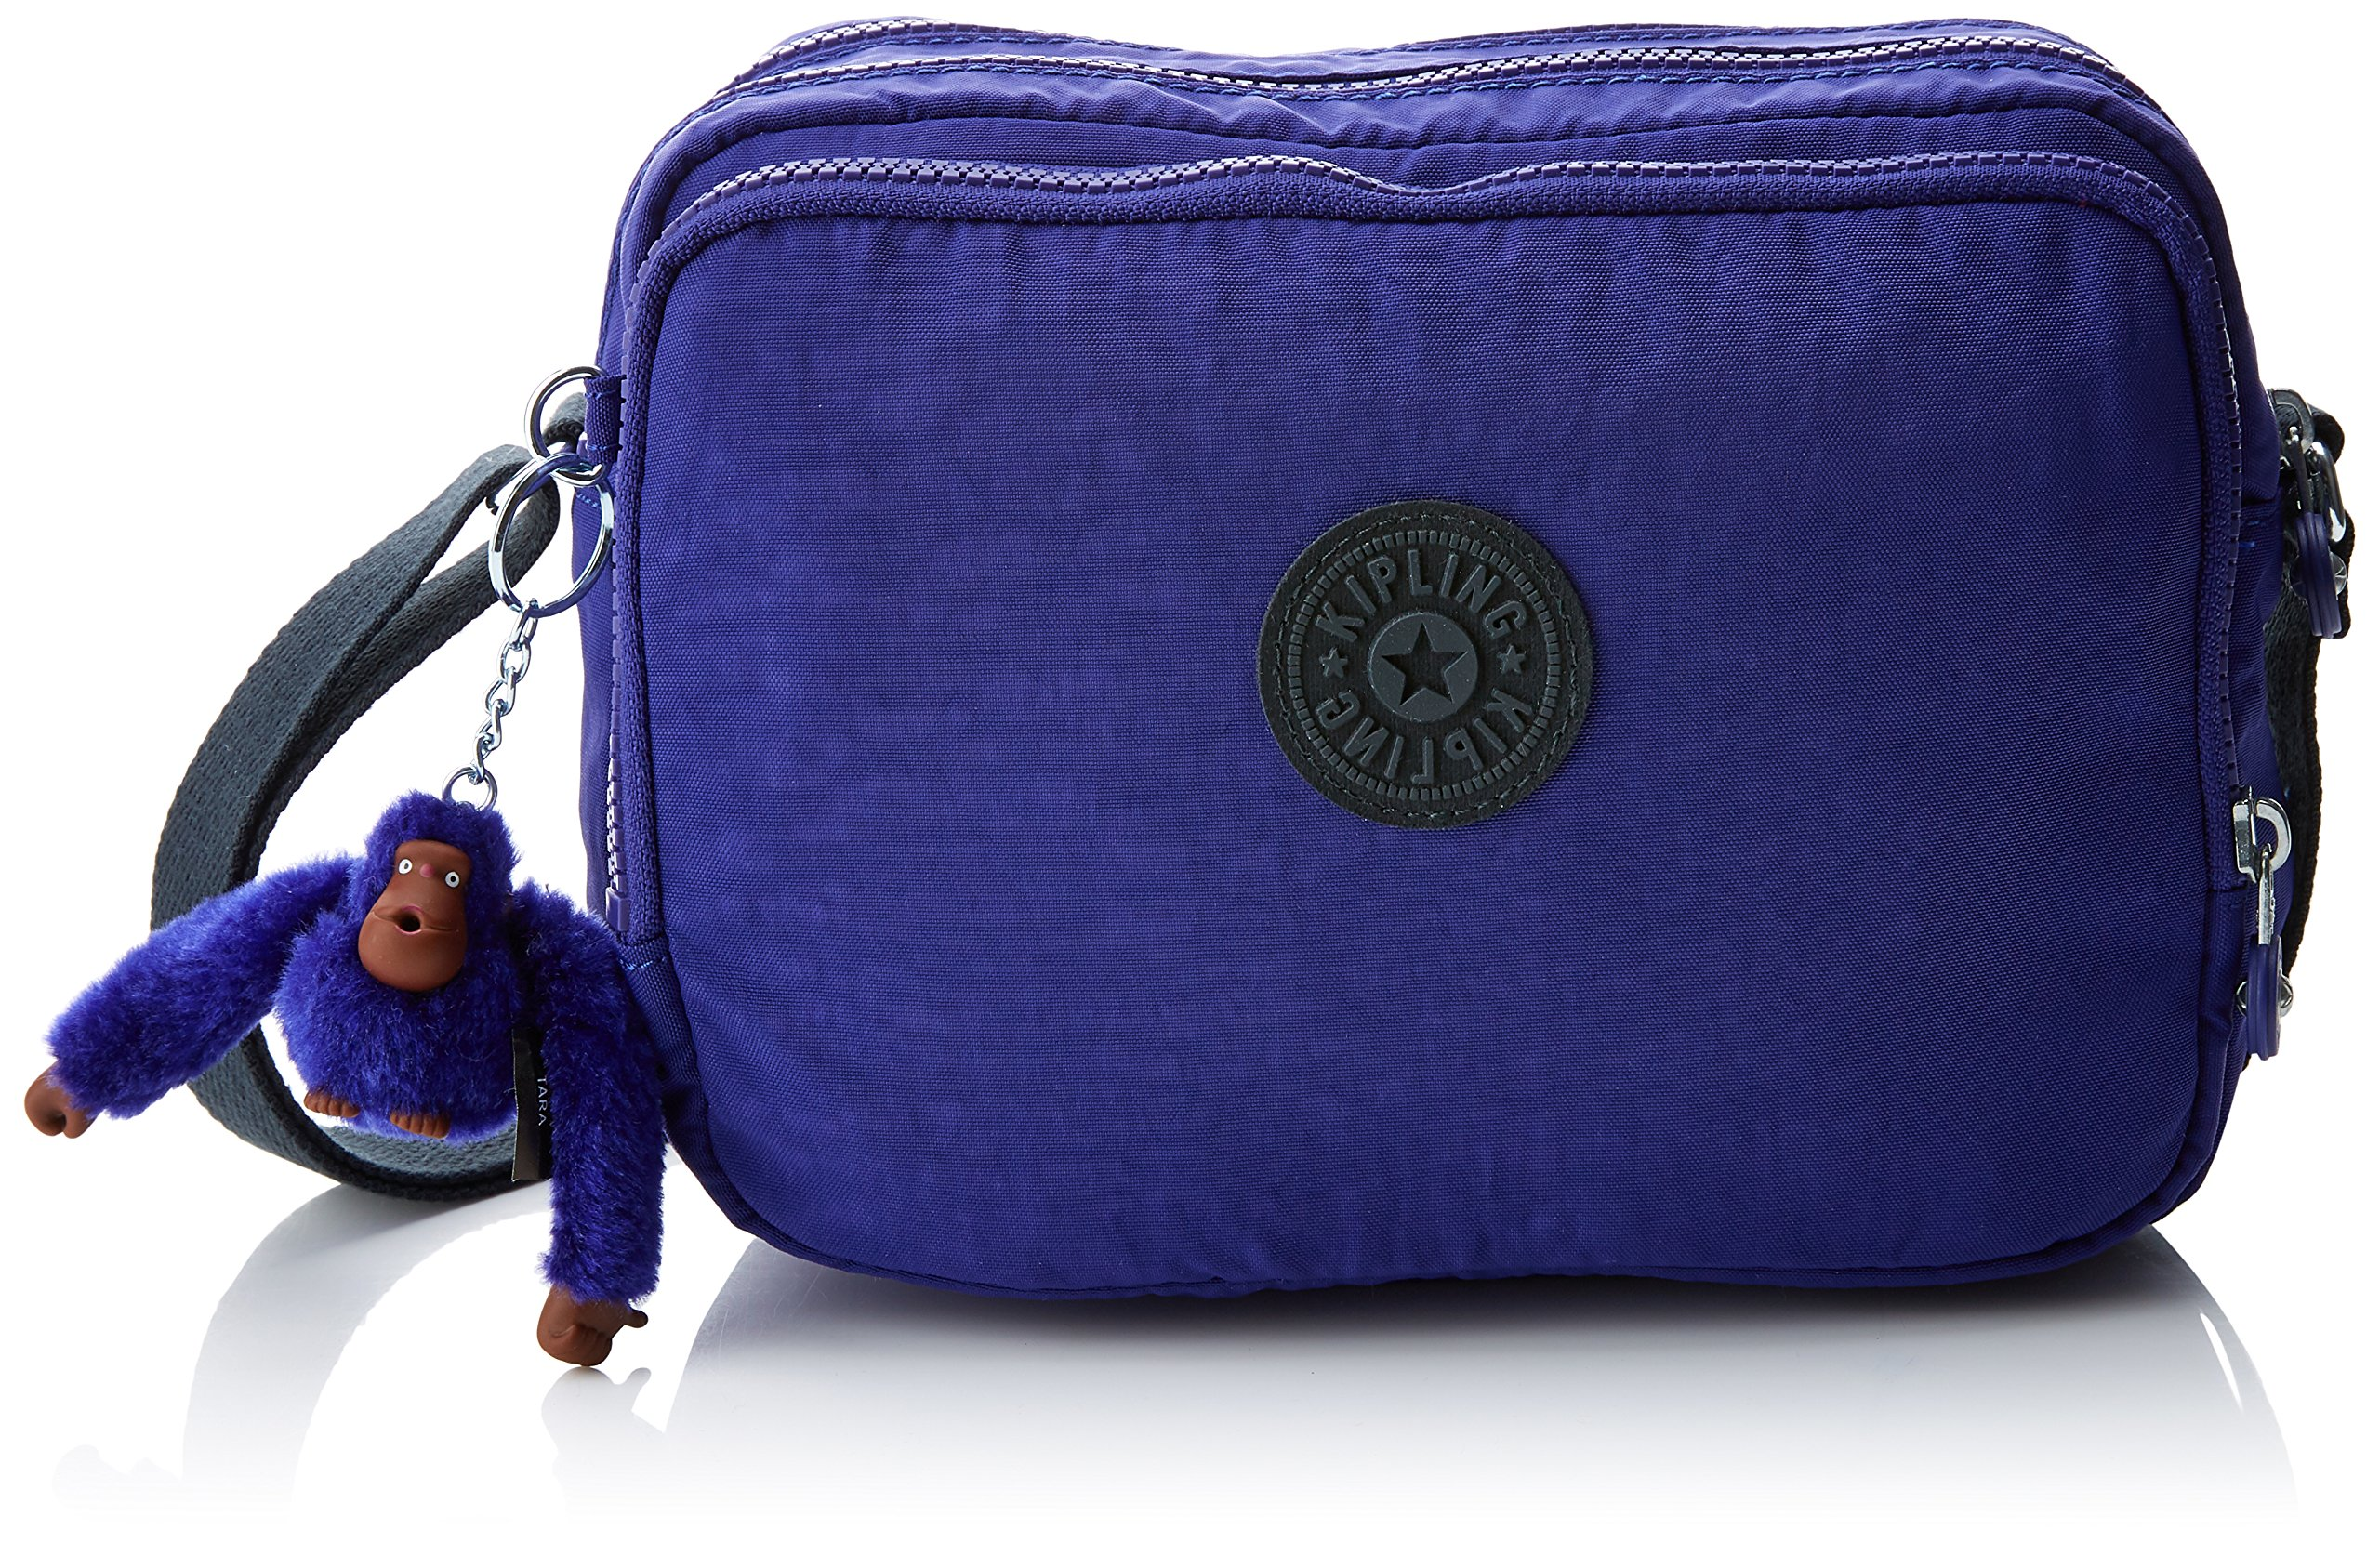 Purple15x24x45 H SilenSacs Cmw FemmeVioletsummer Kipling Bandoulière X L UpSVGLqzM